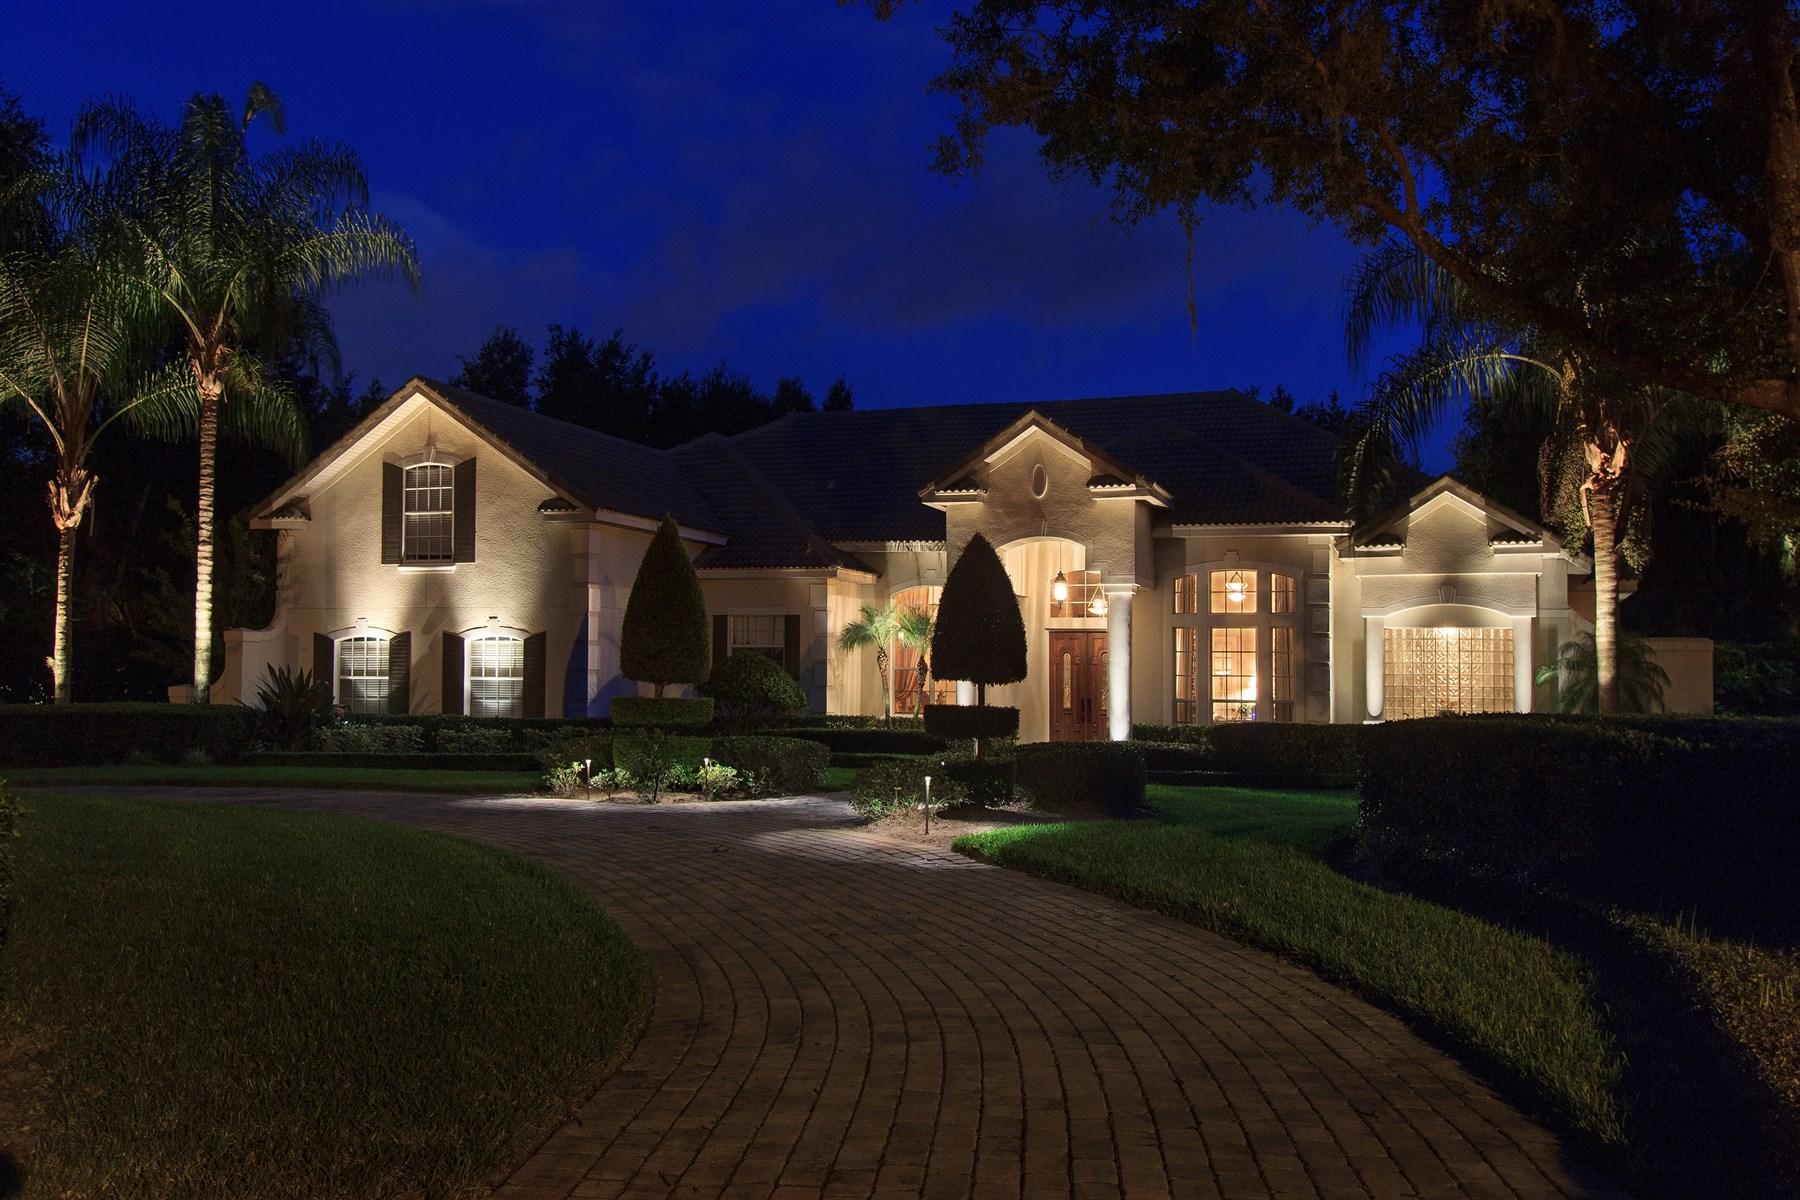 Single Family Home for Sale at Sanford, Florida 7725 Flemingwood Court Sanford, Florida 32771 United States